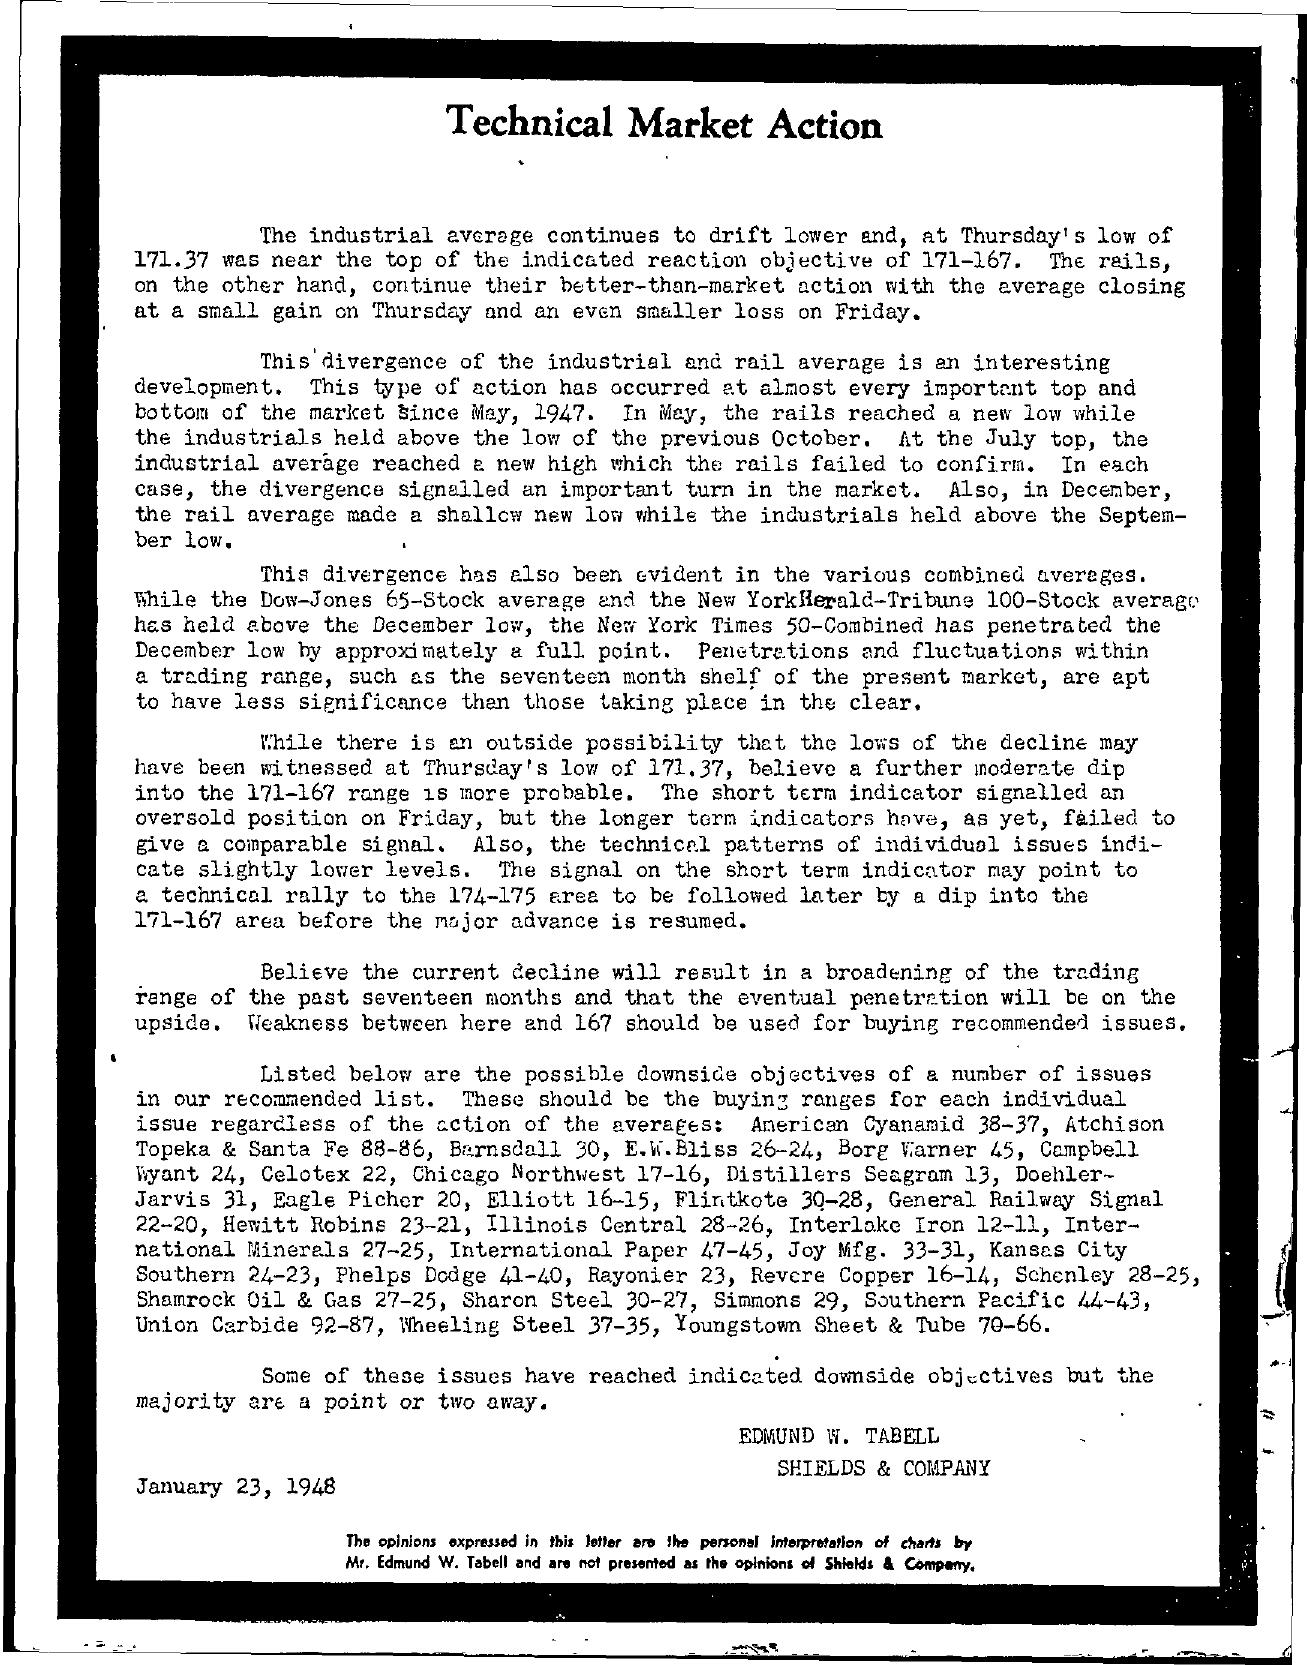 Tabell's Market Letter - January 23, 1948